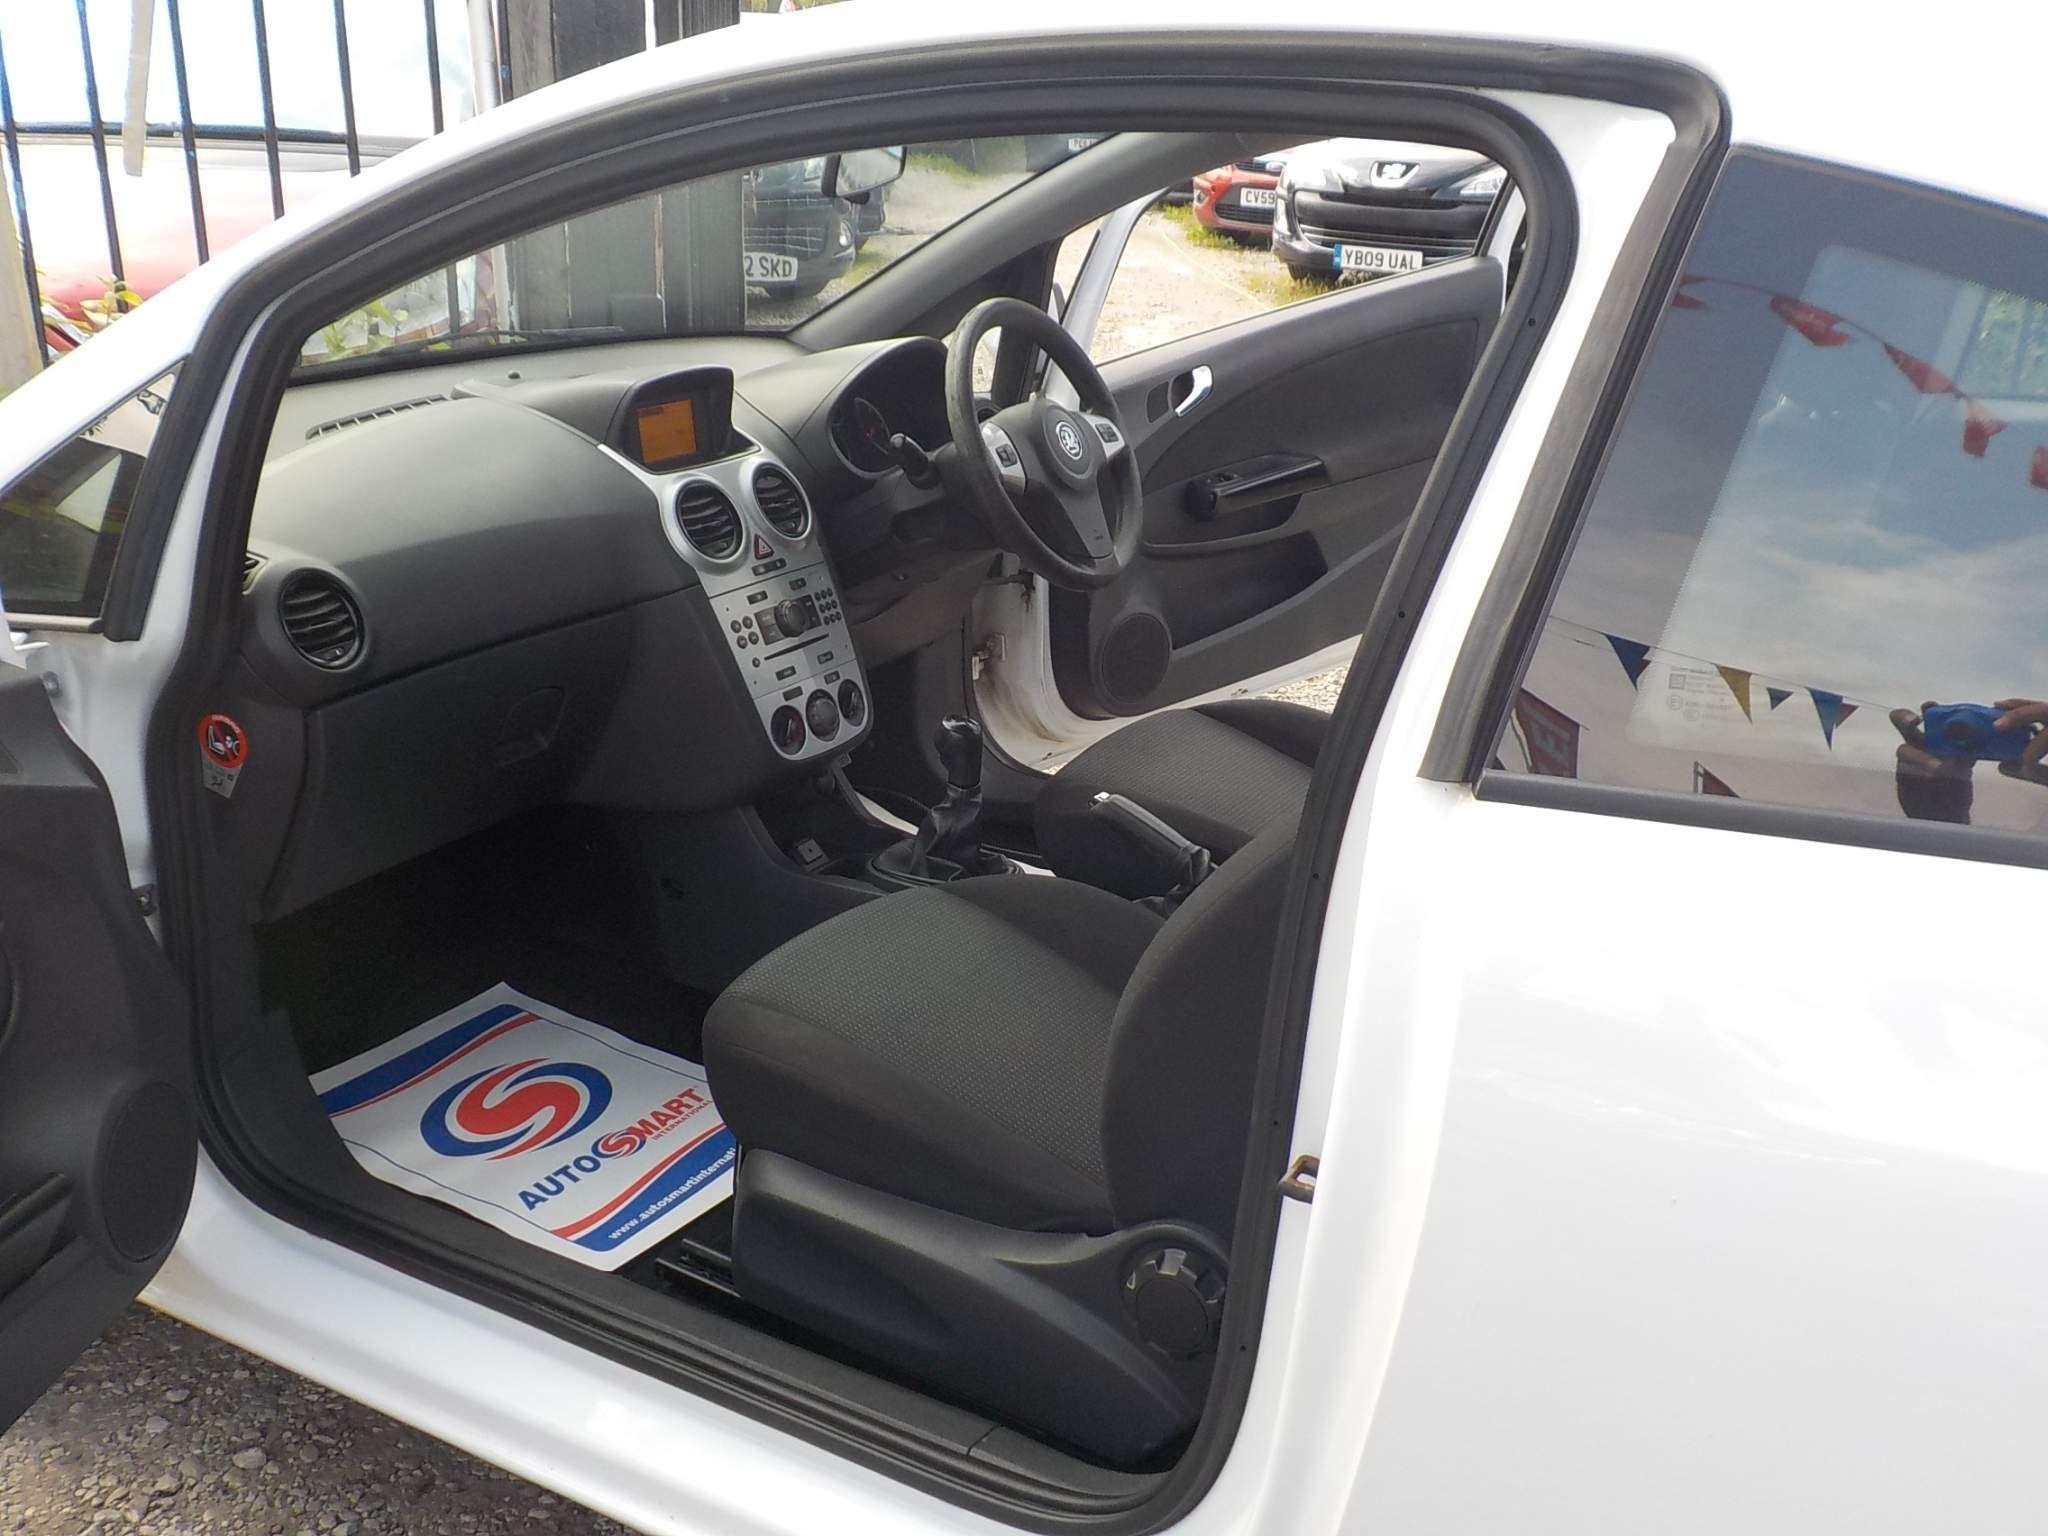 Vauxhall Corsa 1.2 i 16v Excite 3dr